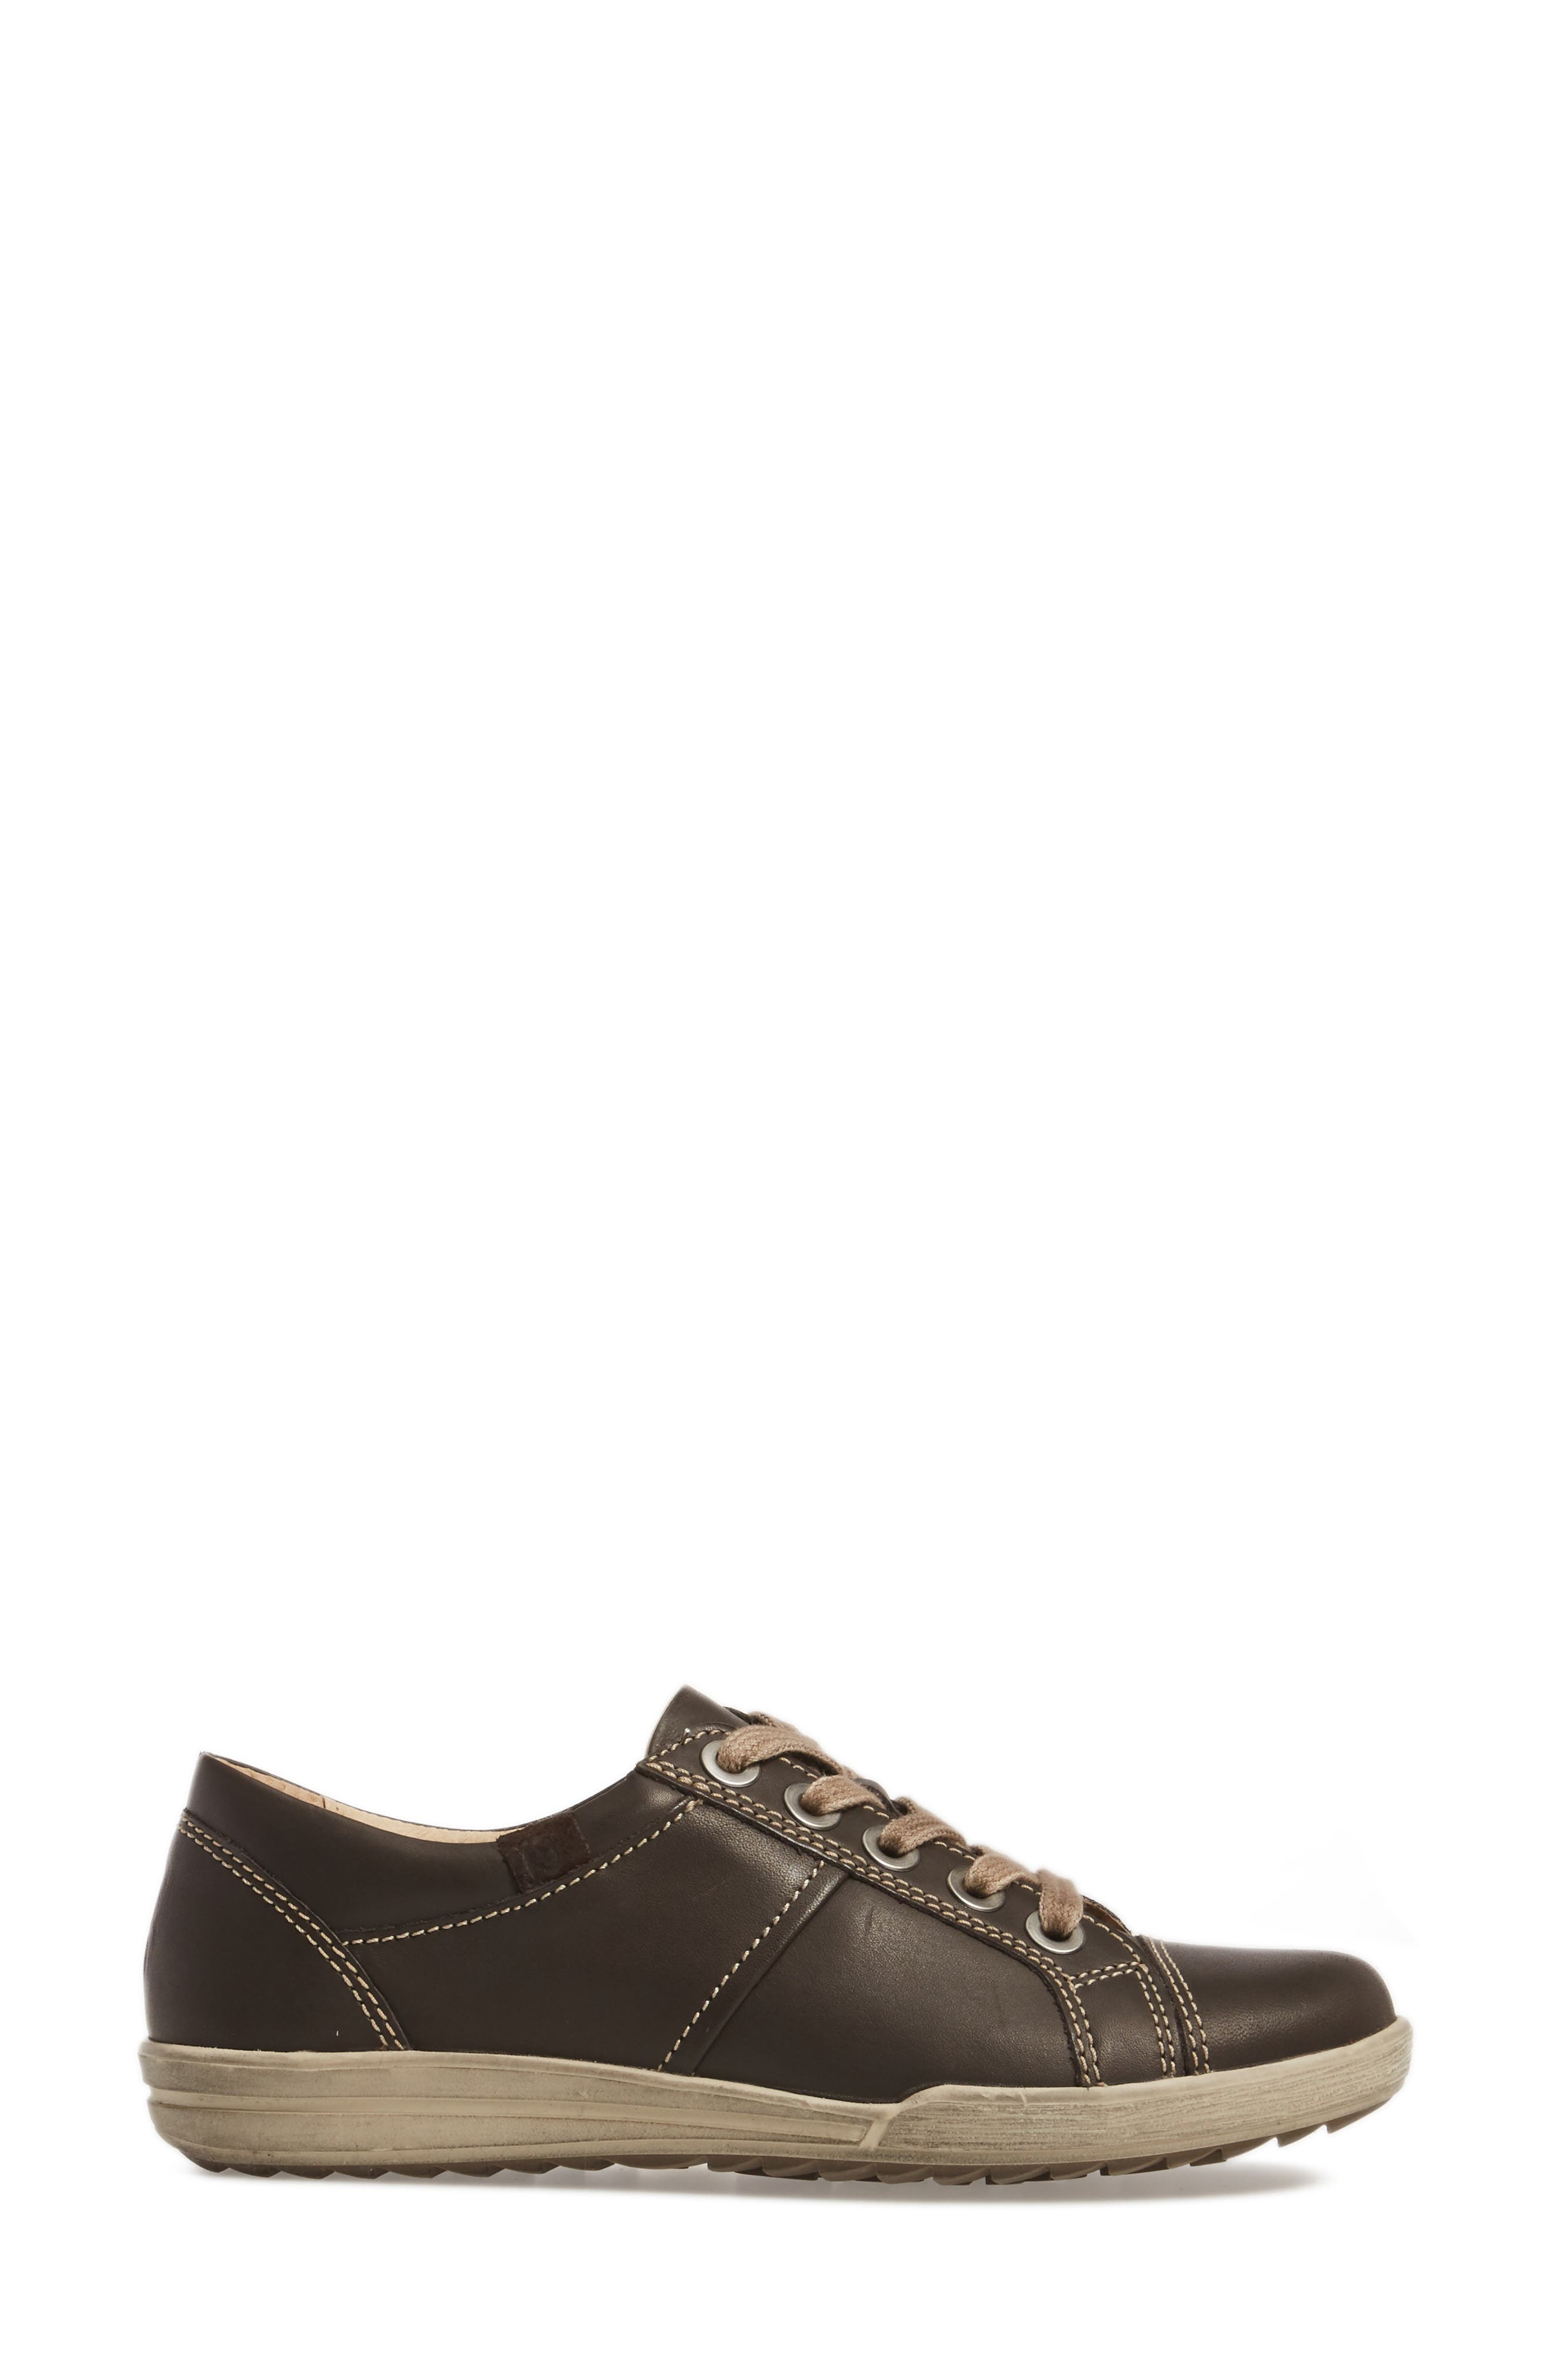 Dany 59 Sneaker,                             Alternate thumbnail 3, color,                             Moro Leather